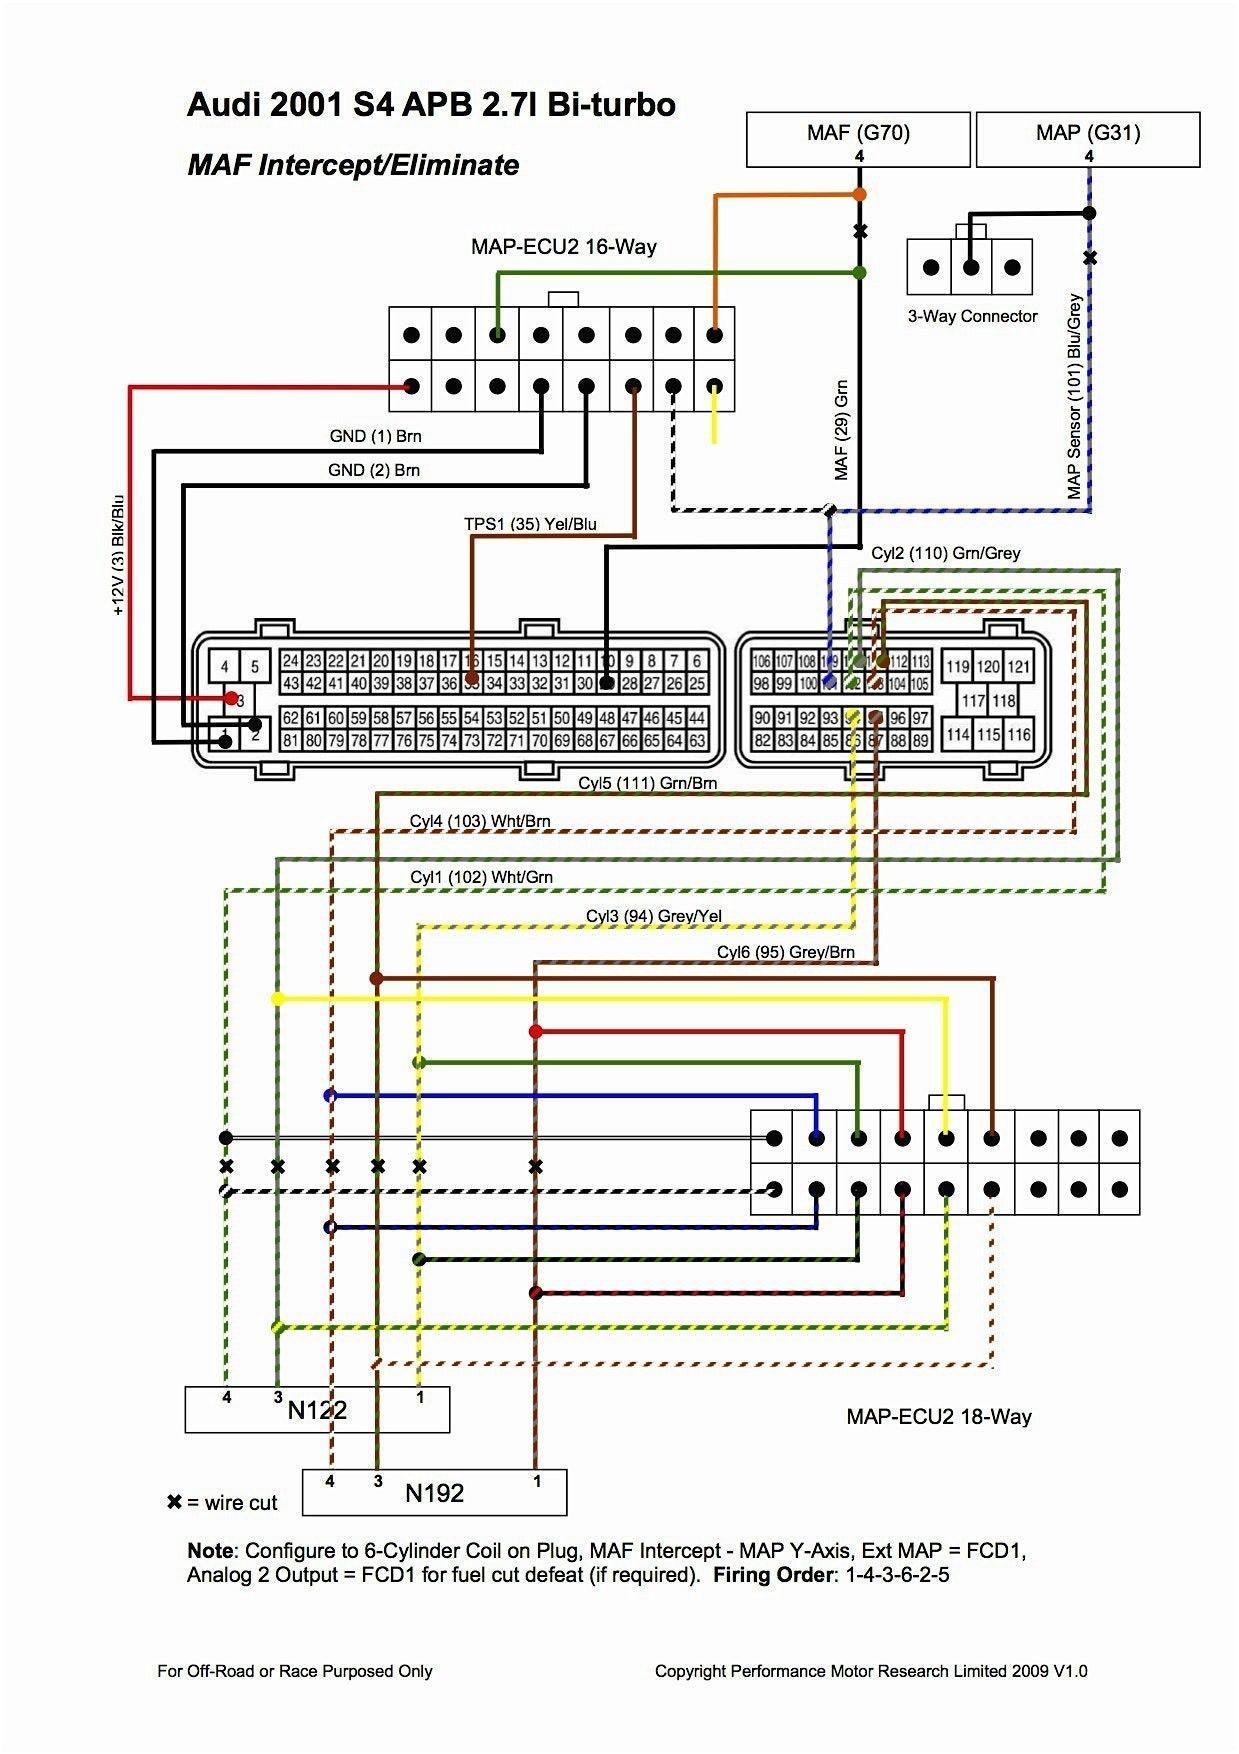 New Kenworth Ac Wiring Diagram Trailer Wiring Diagram Electrical Wiring Diagram Diagram